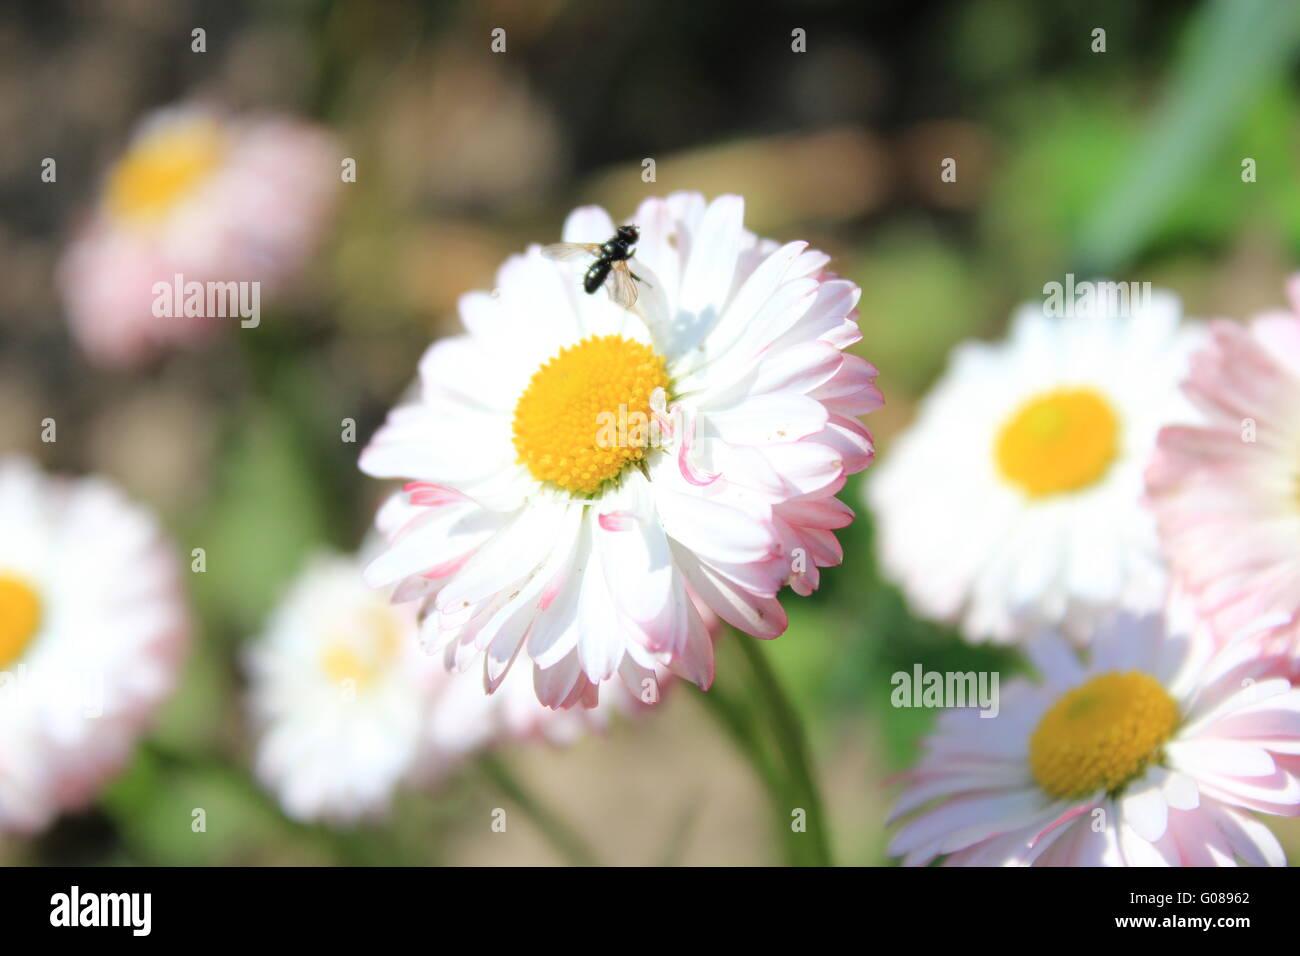 Shape daisy stock photos shape daisy stock images alamy little fly on the beautiful flowers of daisy stock image izmirmasajfo Choice Image